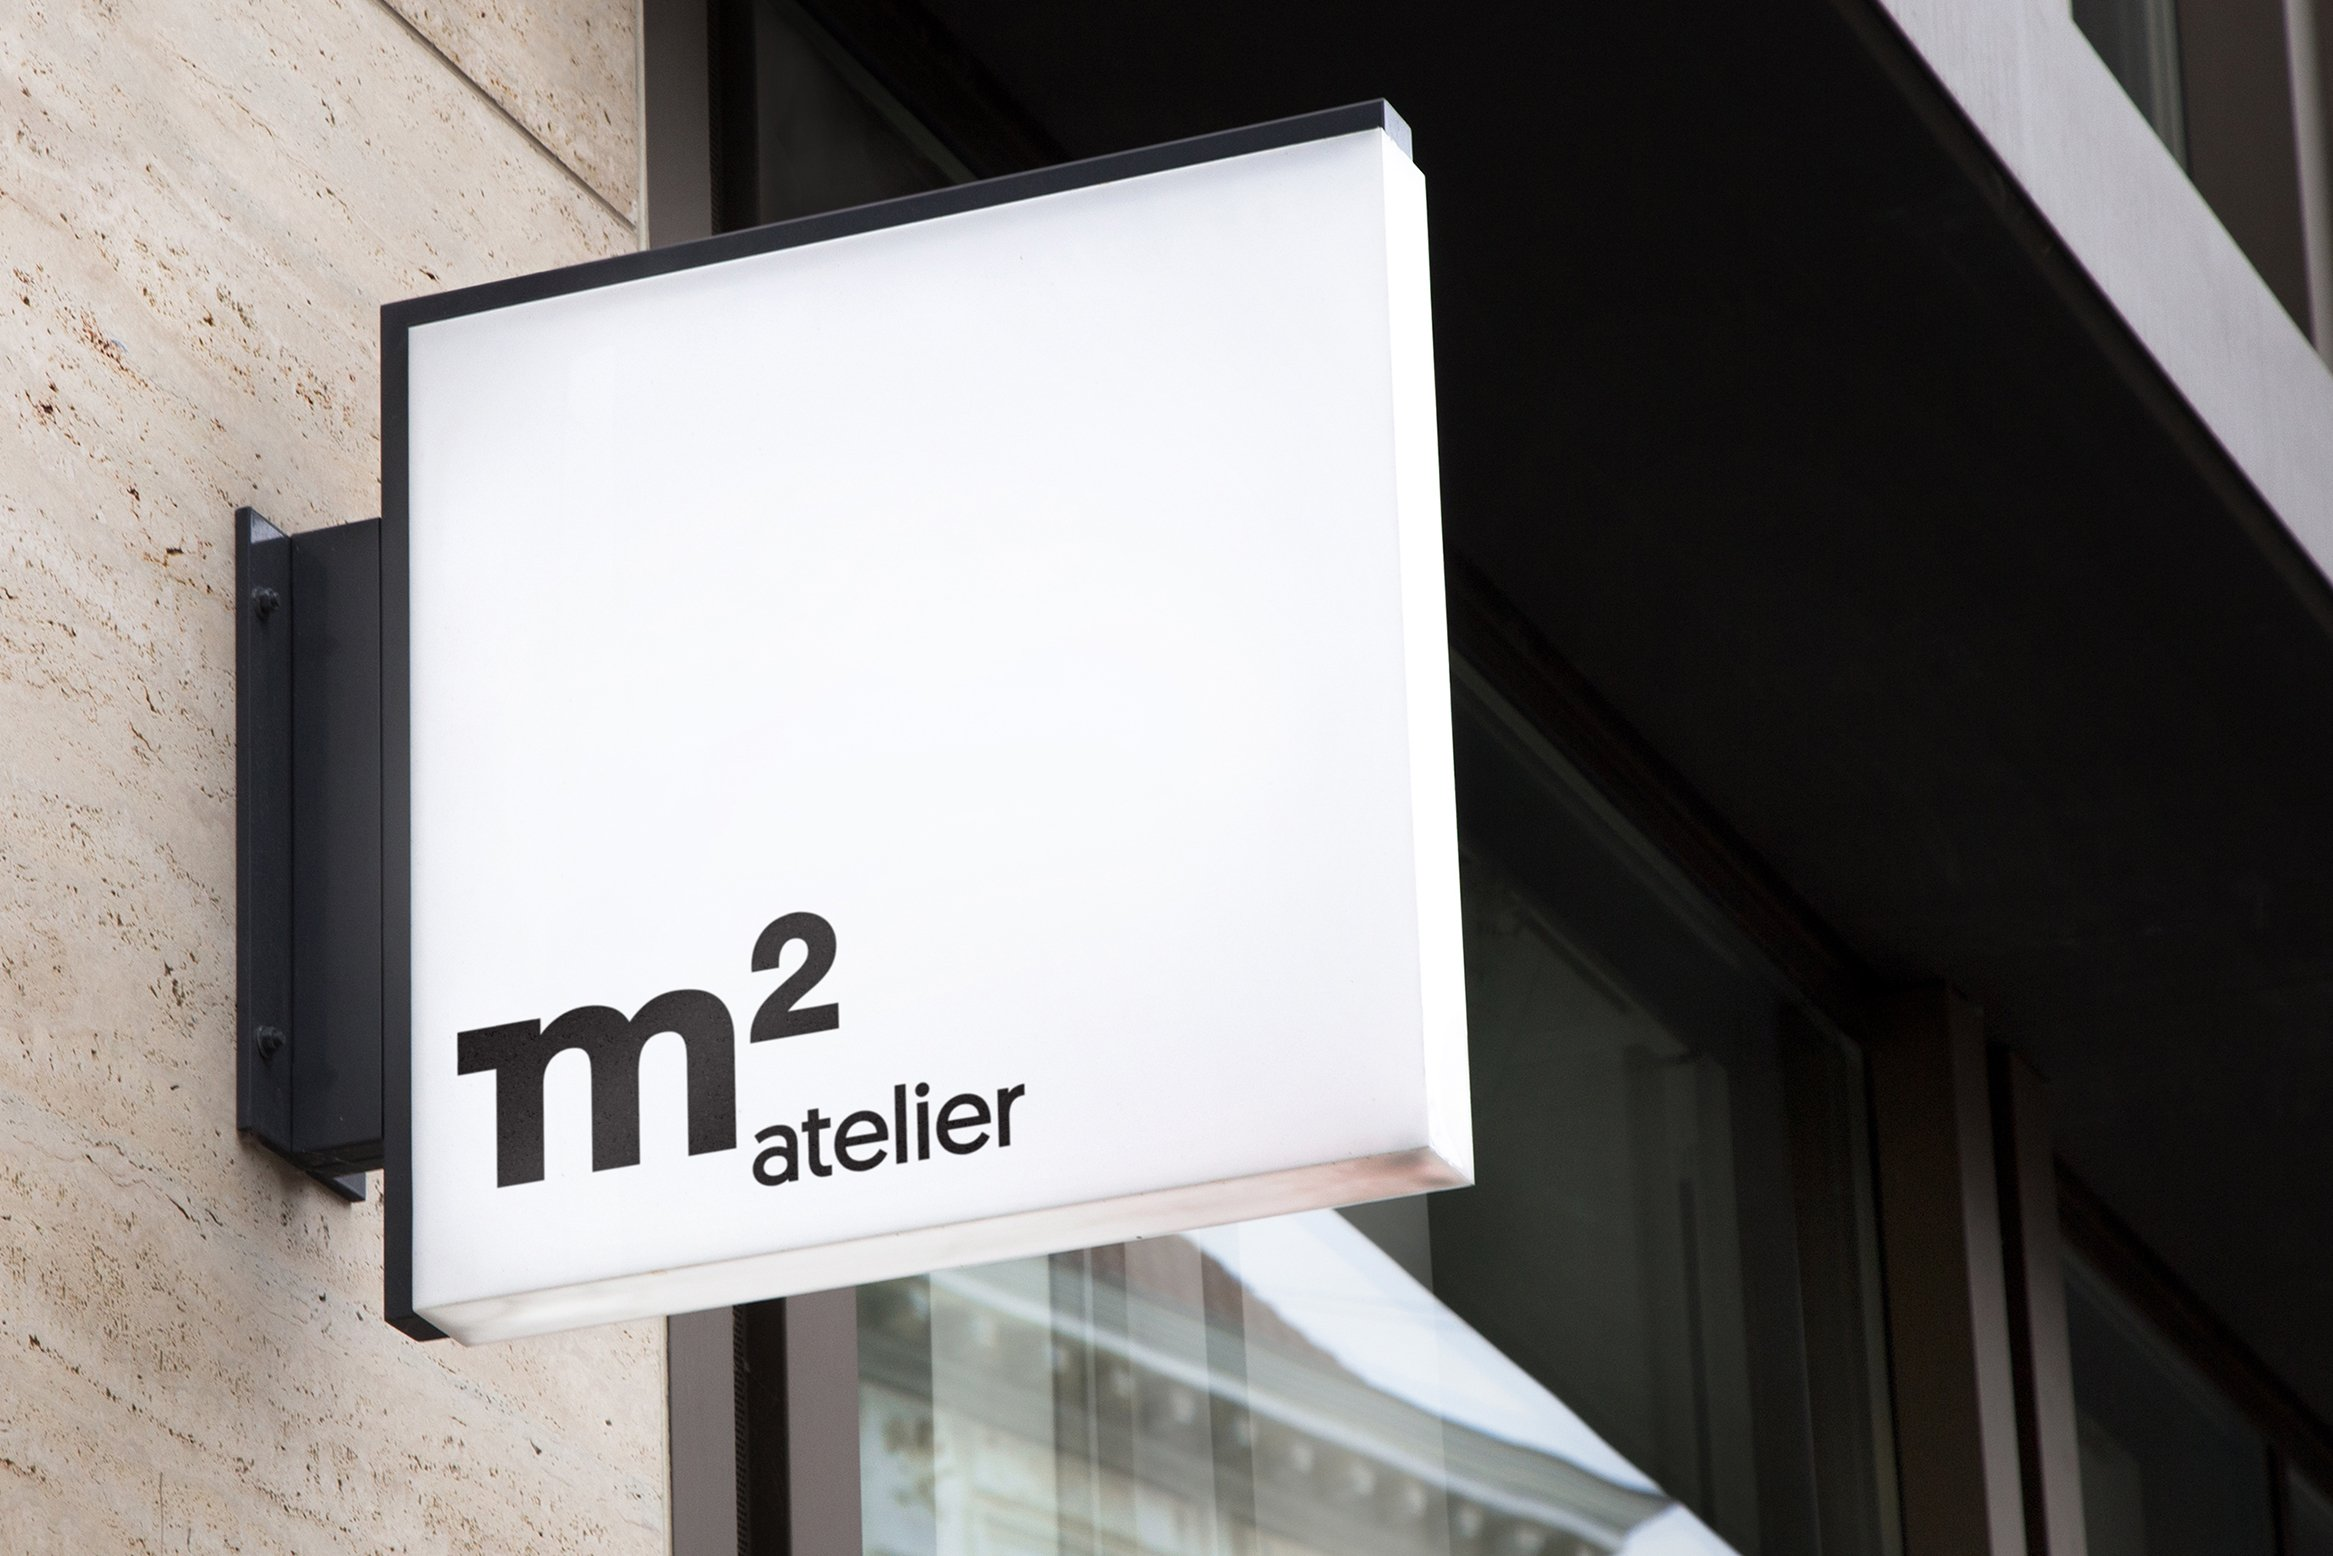 M2 atelier